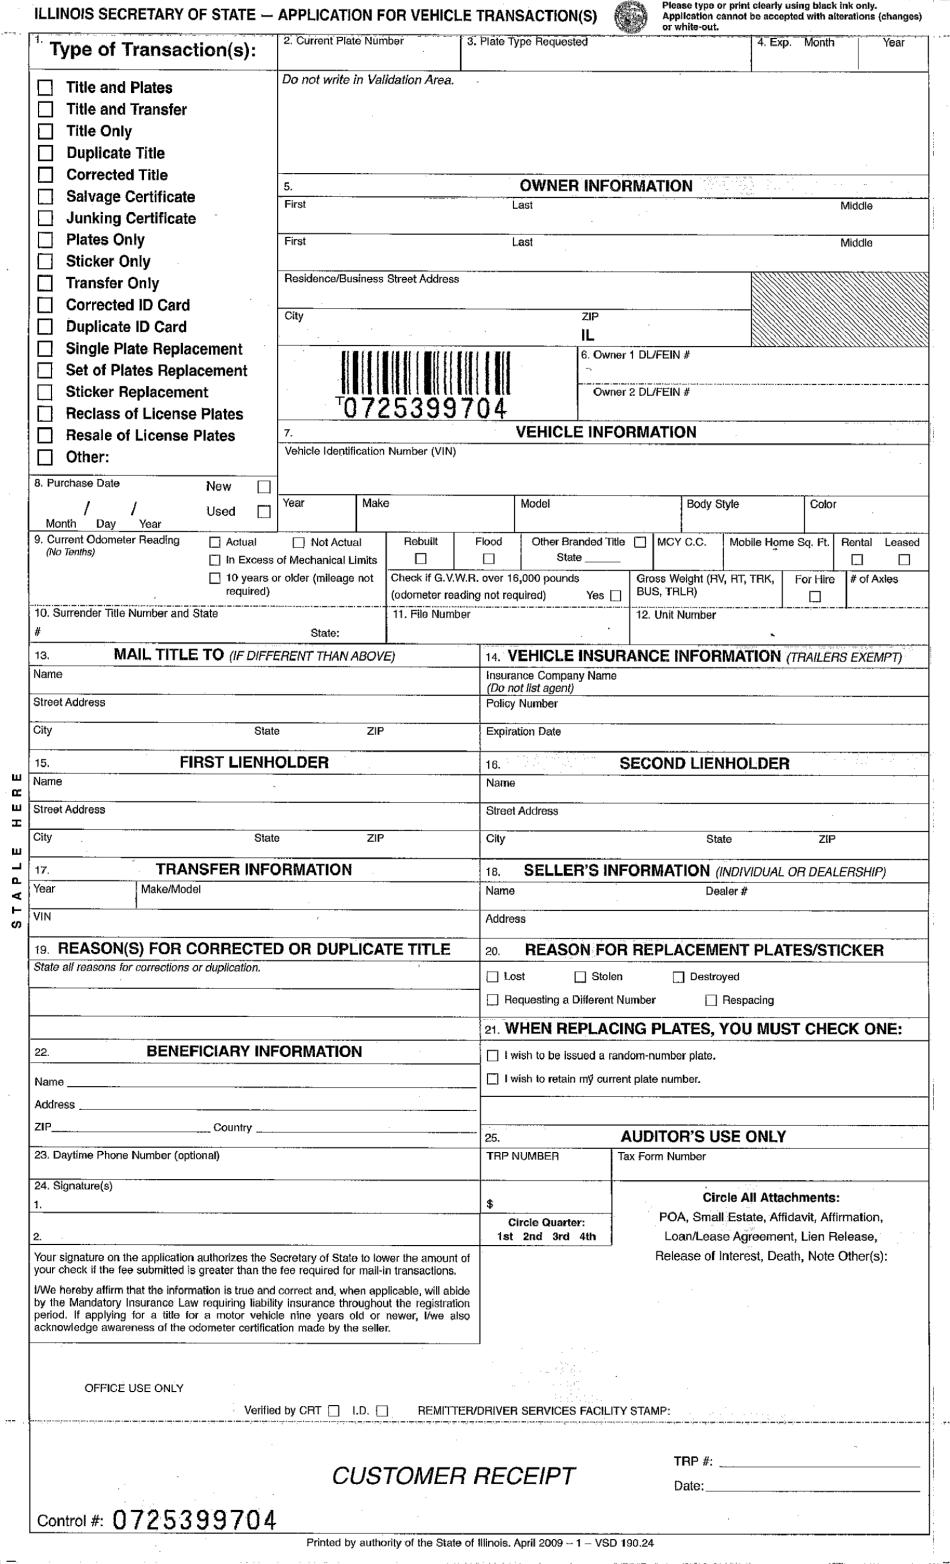 Illinois Duplicate Title Application Pdf